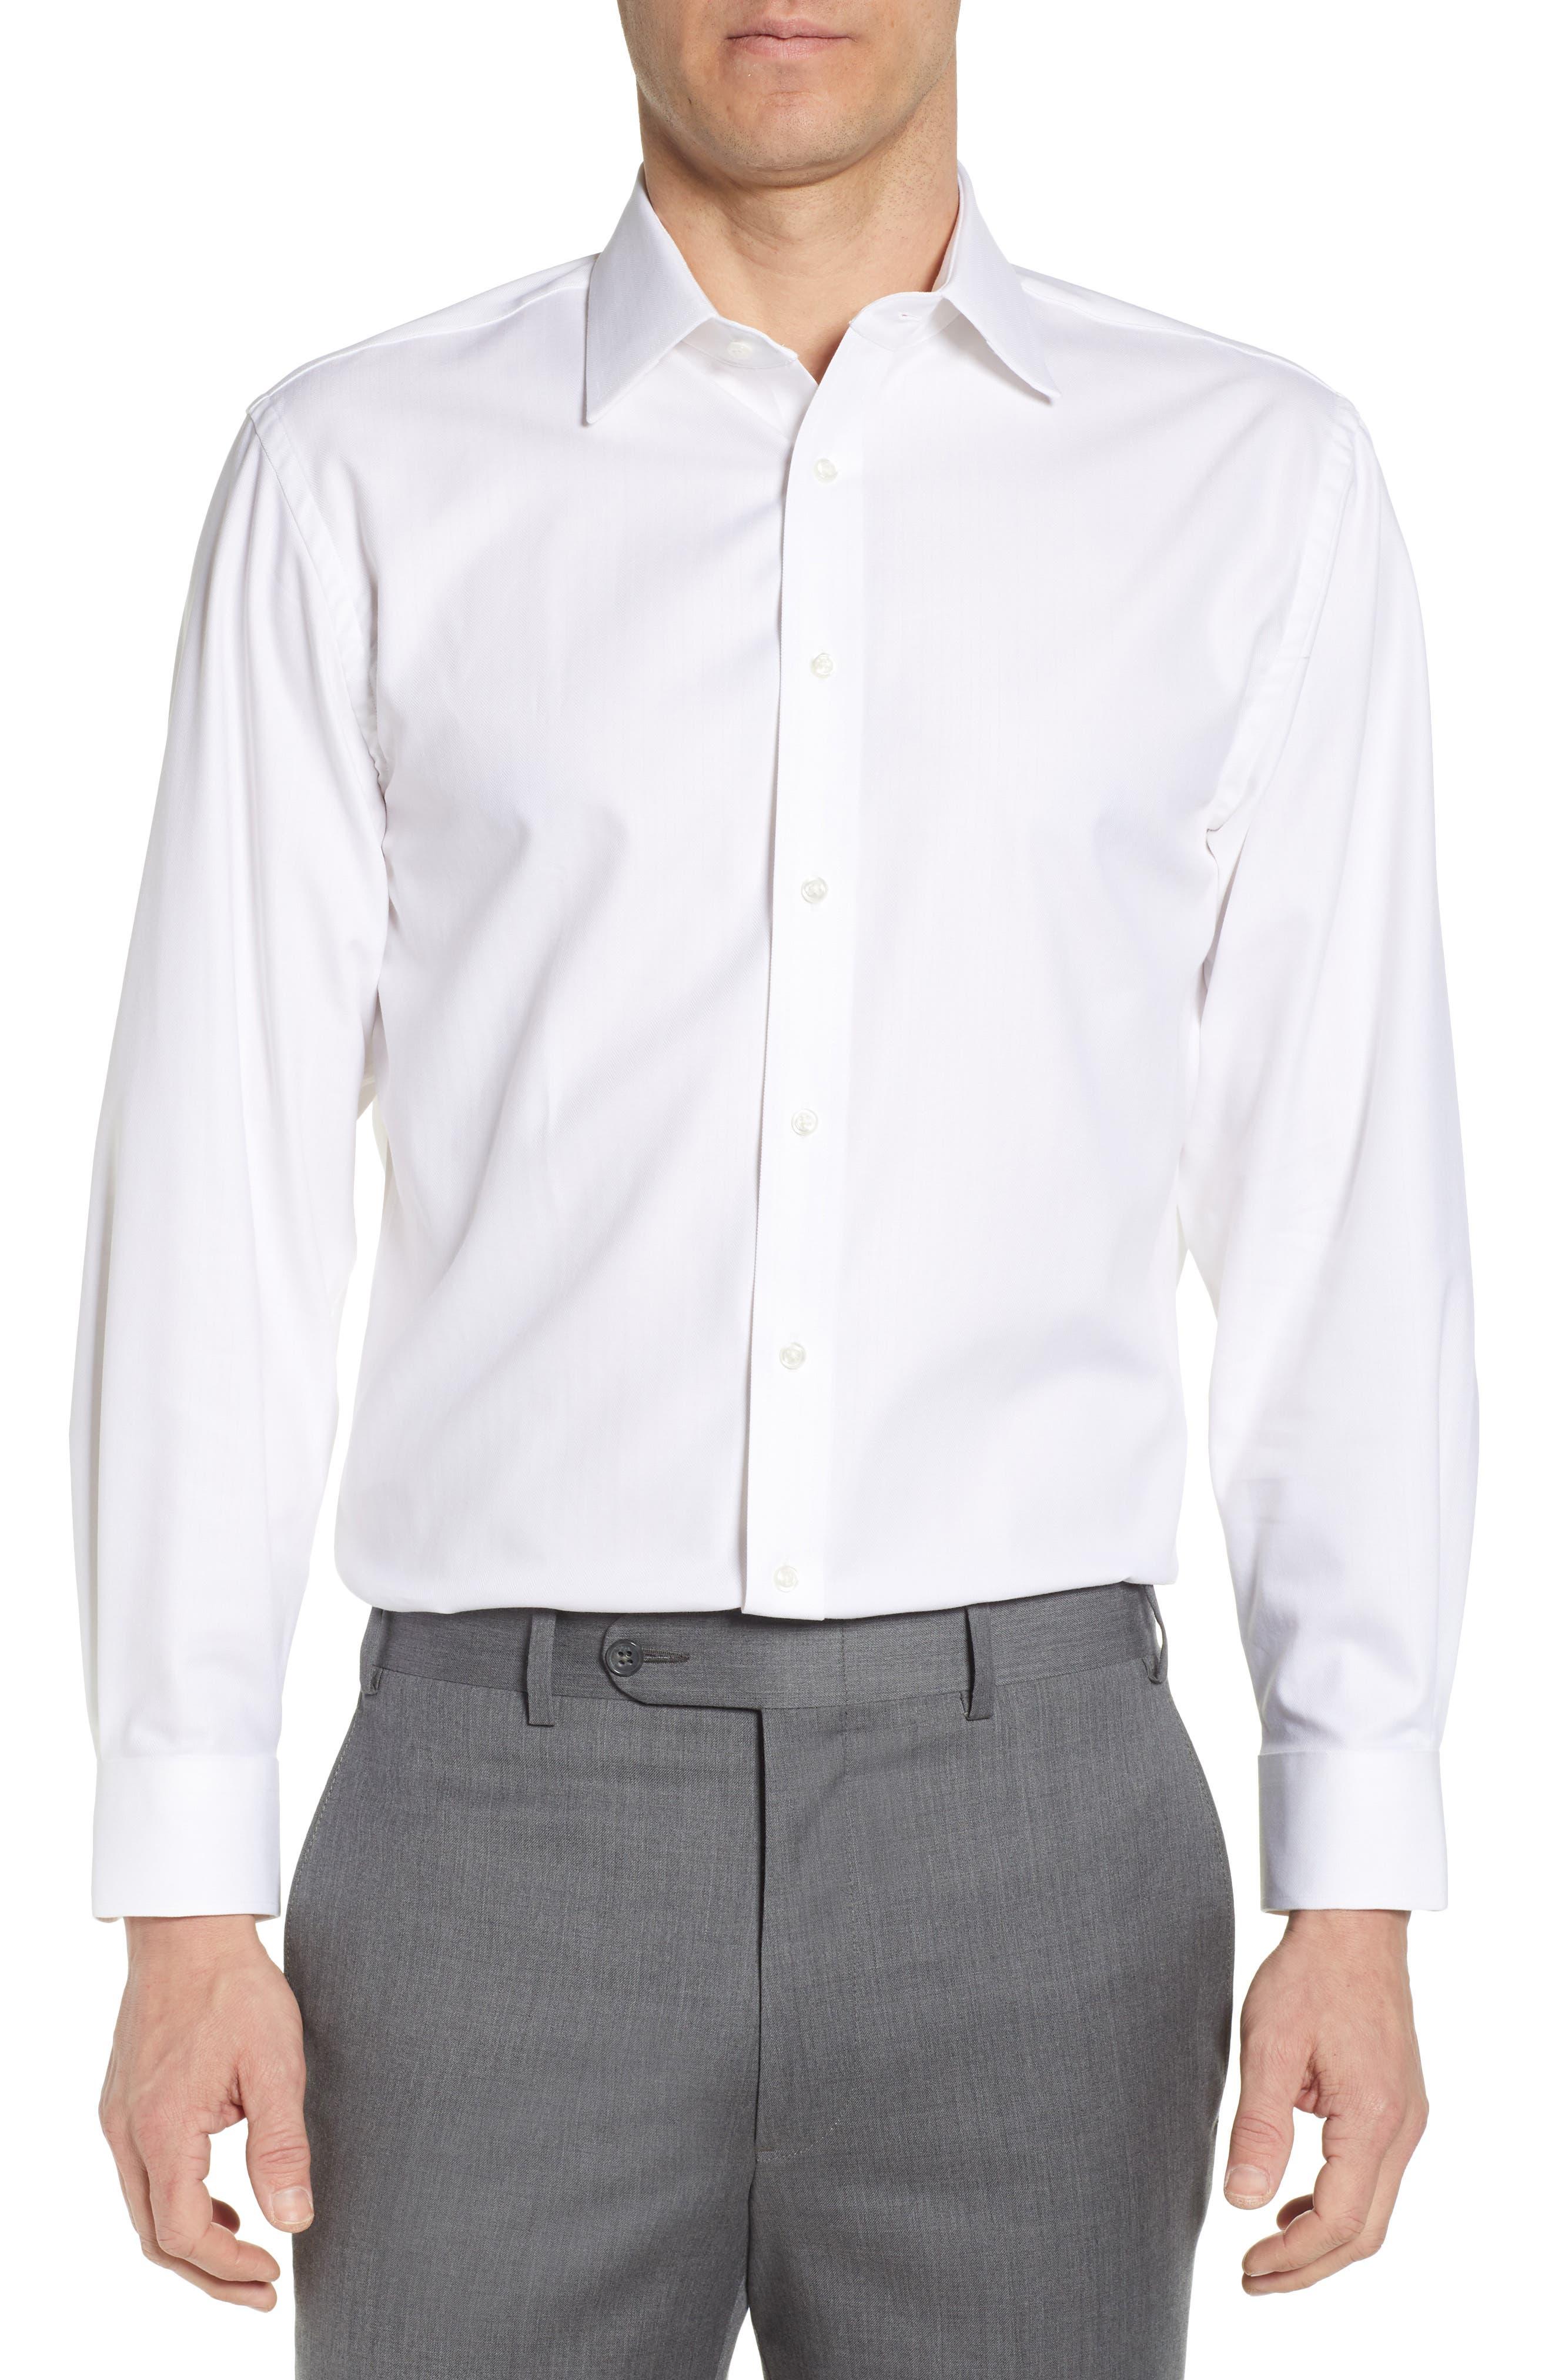 NORDSTROM MEN'S SHOP, Tech-Smart Traditional Fit Stretch Herringbone Dress Shirt, Main thumbnail 1, color, WHITE